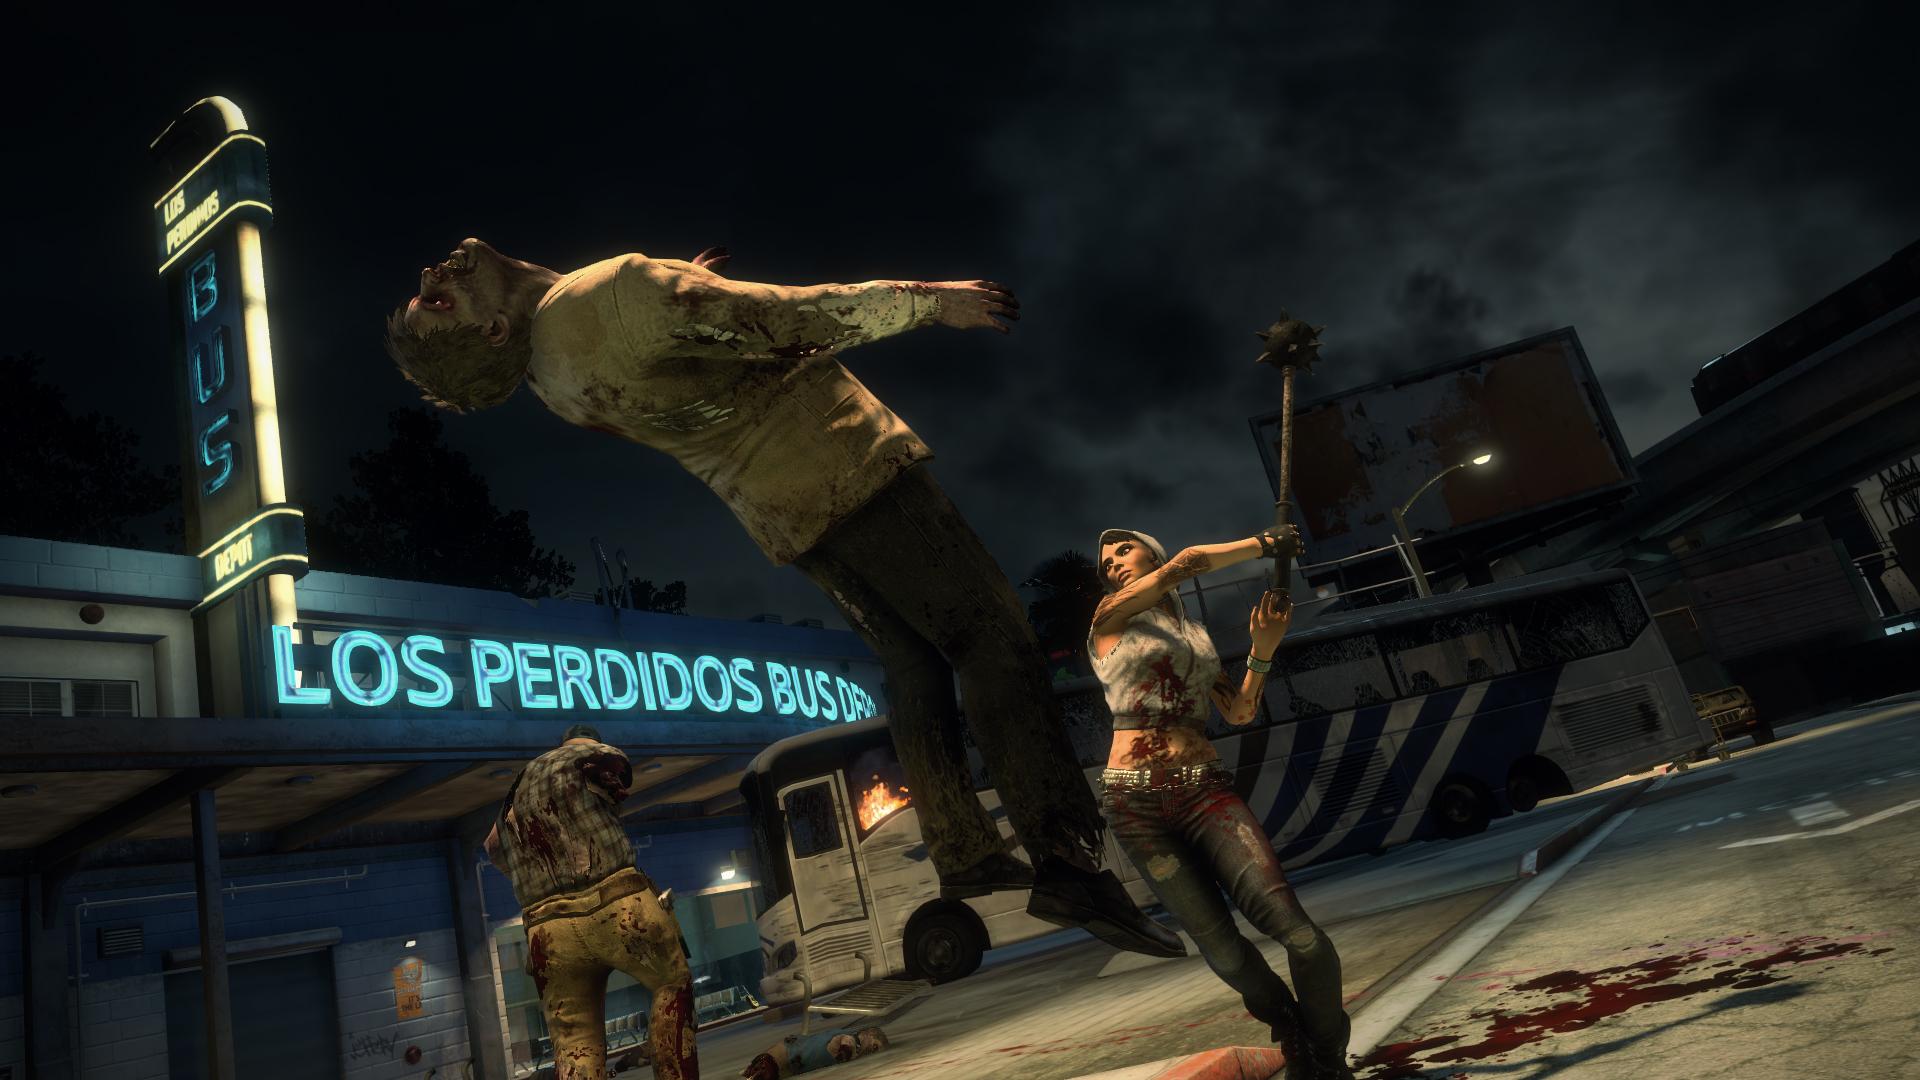 DeadRising3-FallenAngel Xbox One Editeur 006